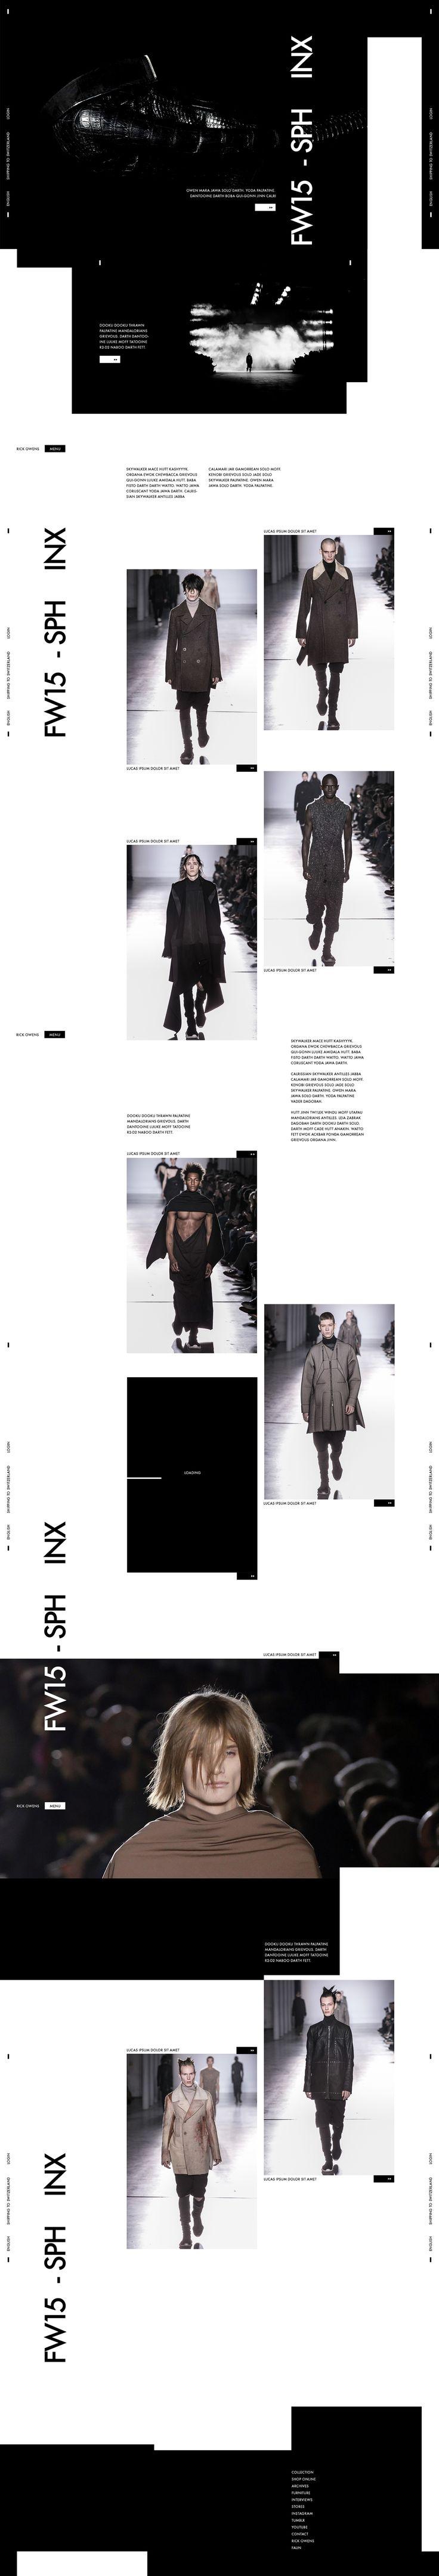 Web | Rick Owens Concept on Behance